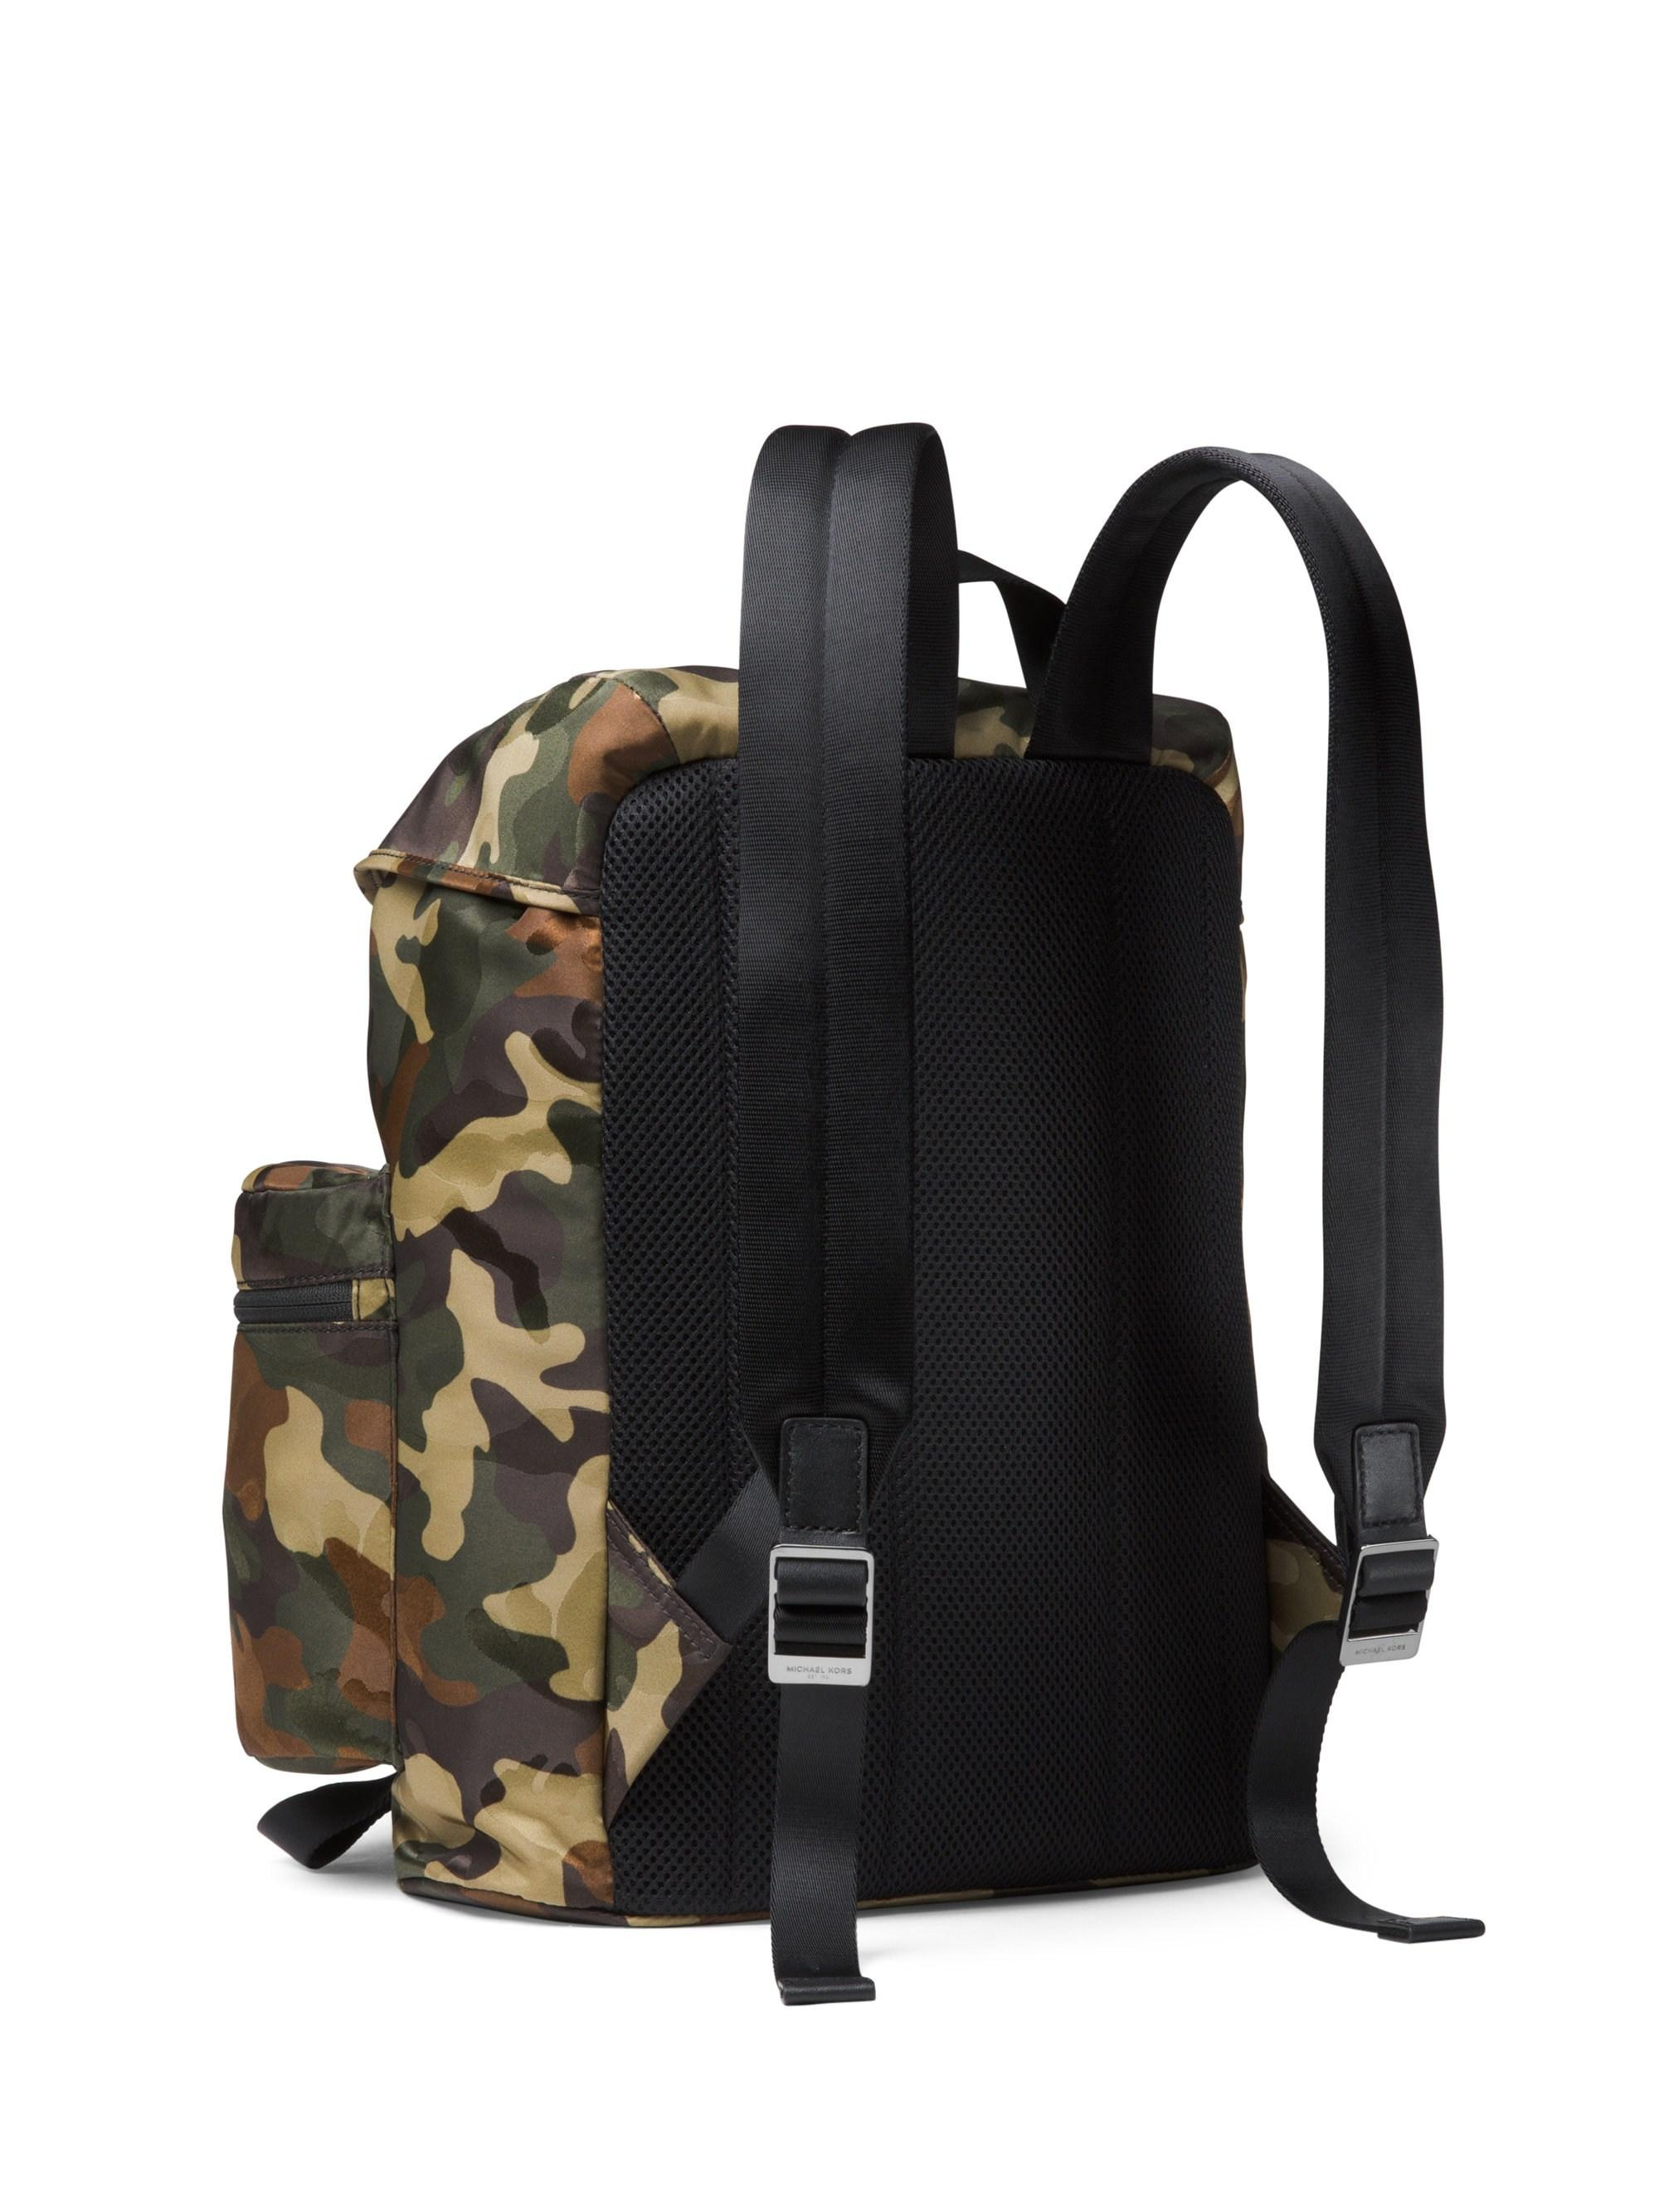 414cab1a1d9d Michael Kors Kent Sport Zip Camo Backpack in Green for Men - Lyst